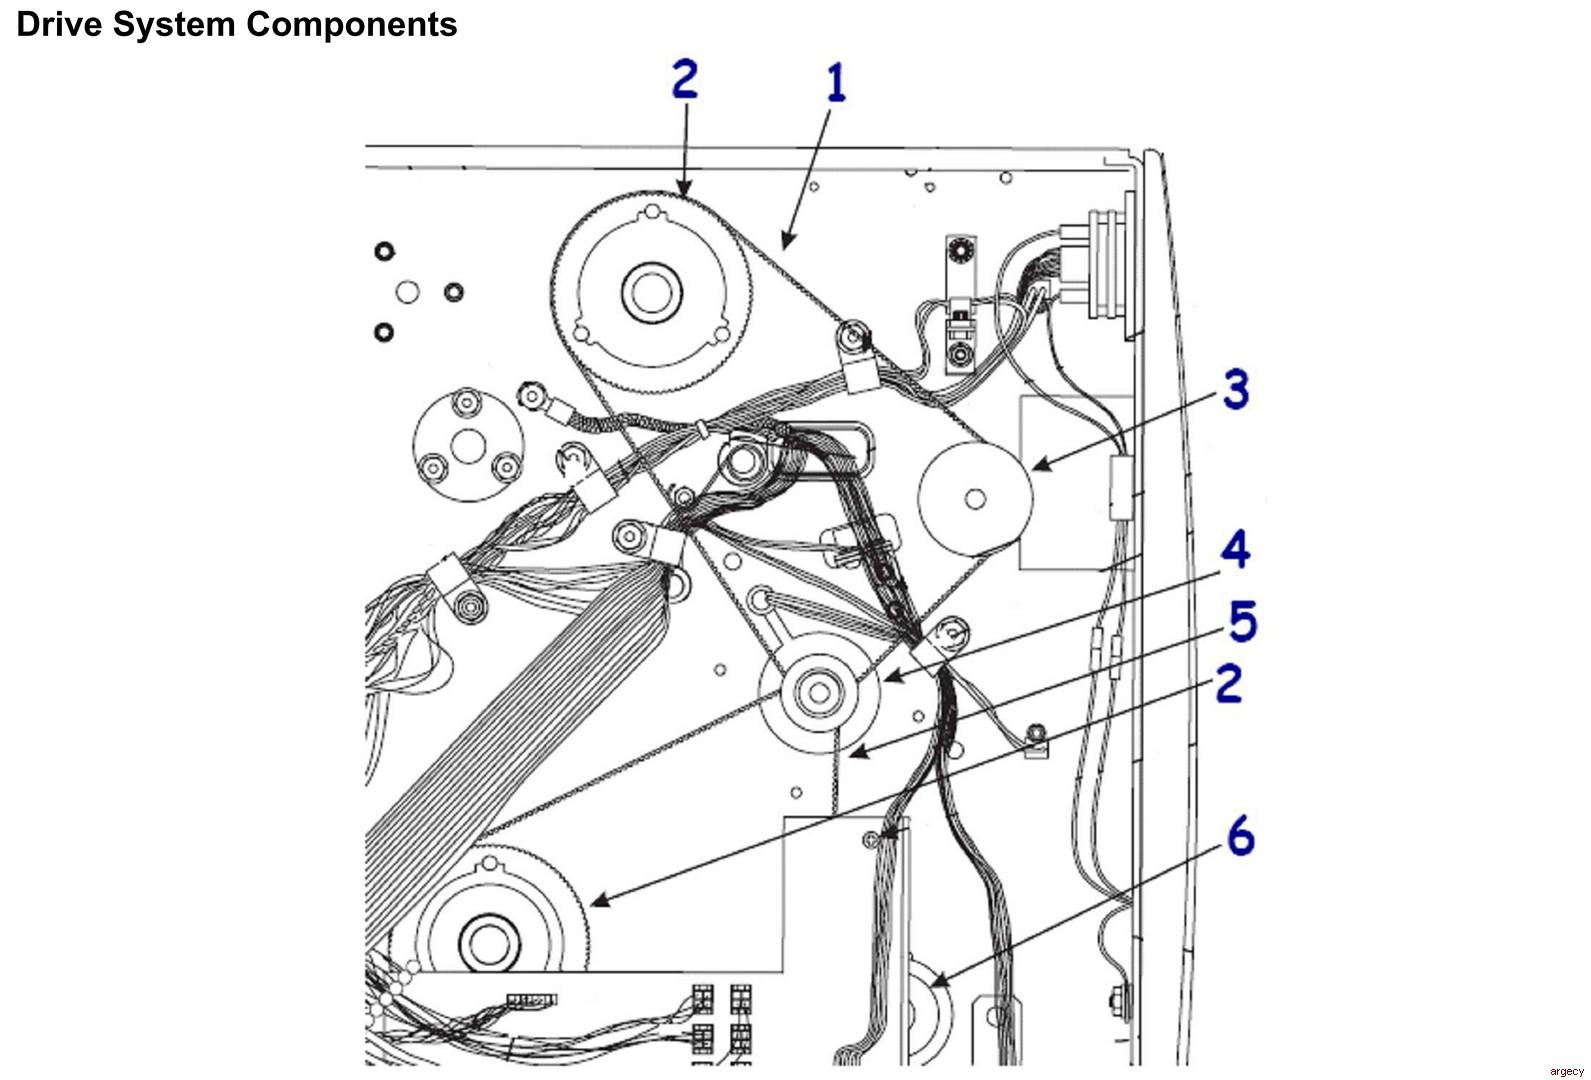 http://www.argecy.com/images/90Xi3Plus_96Xi3Plus_140Xi3Plus_170Xi3Plus_220Xi3Plus_Parts-6_cr.jpg